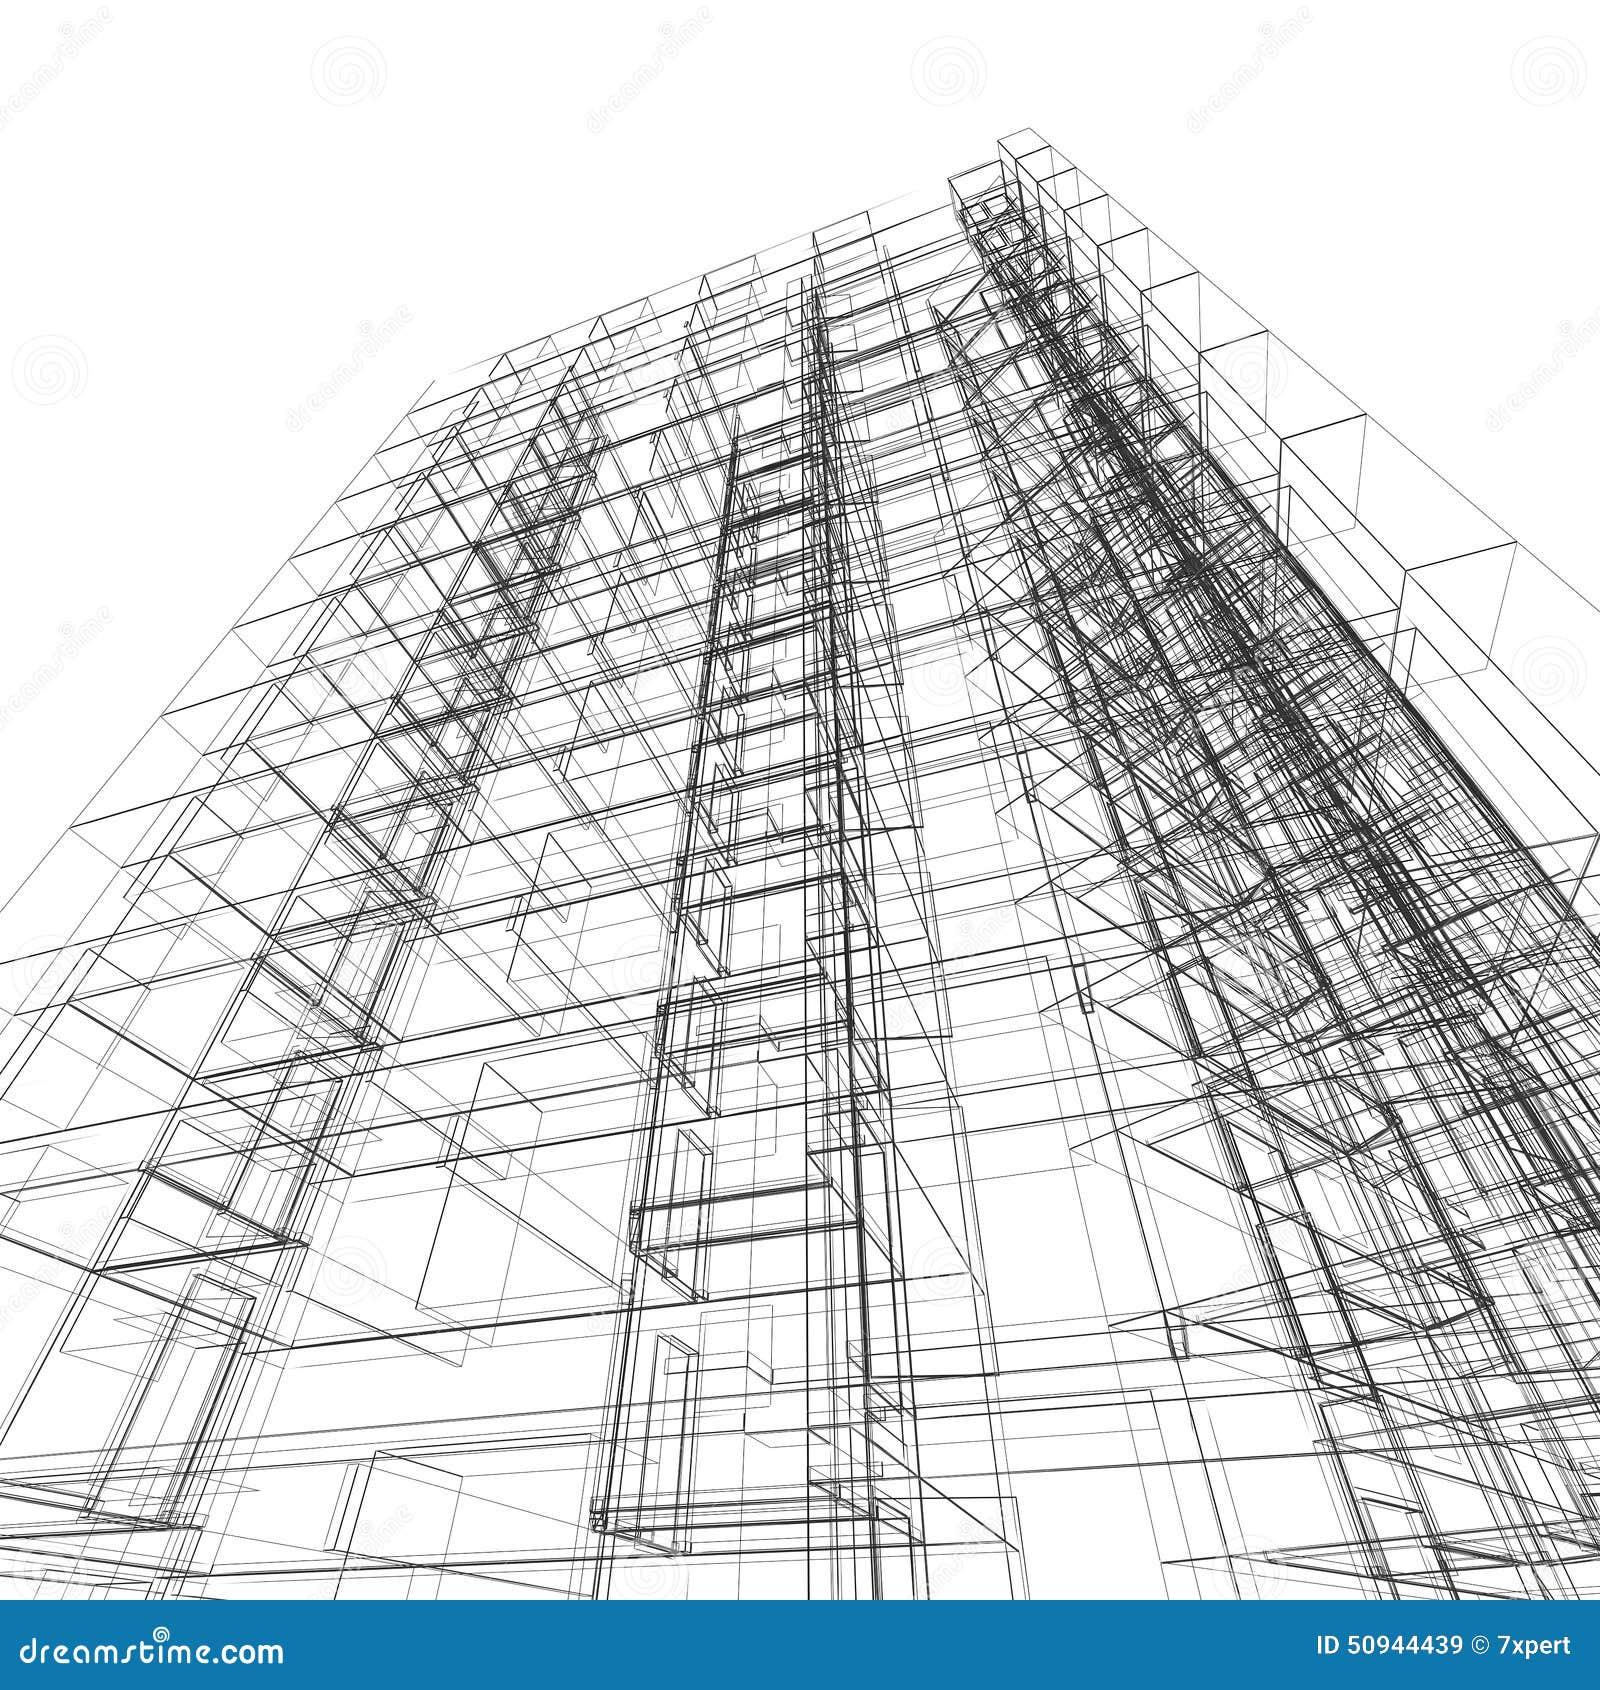 arquitectura de la construcci n stock de ilustraci n On construccion arquitectura